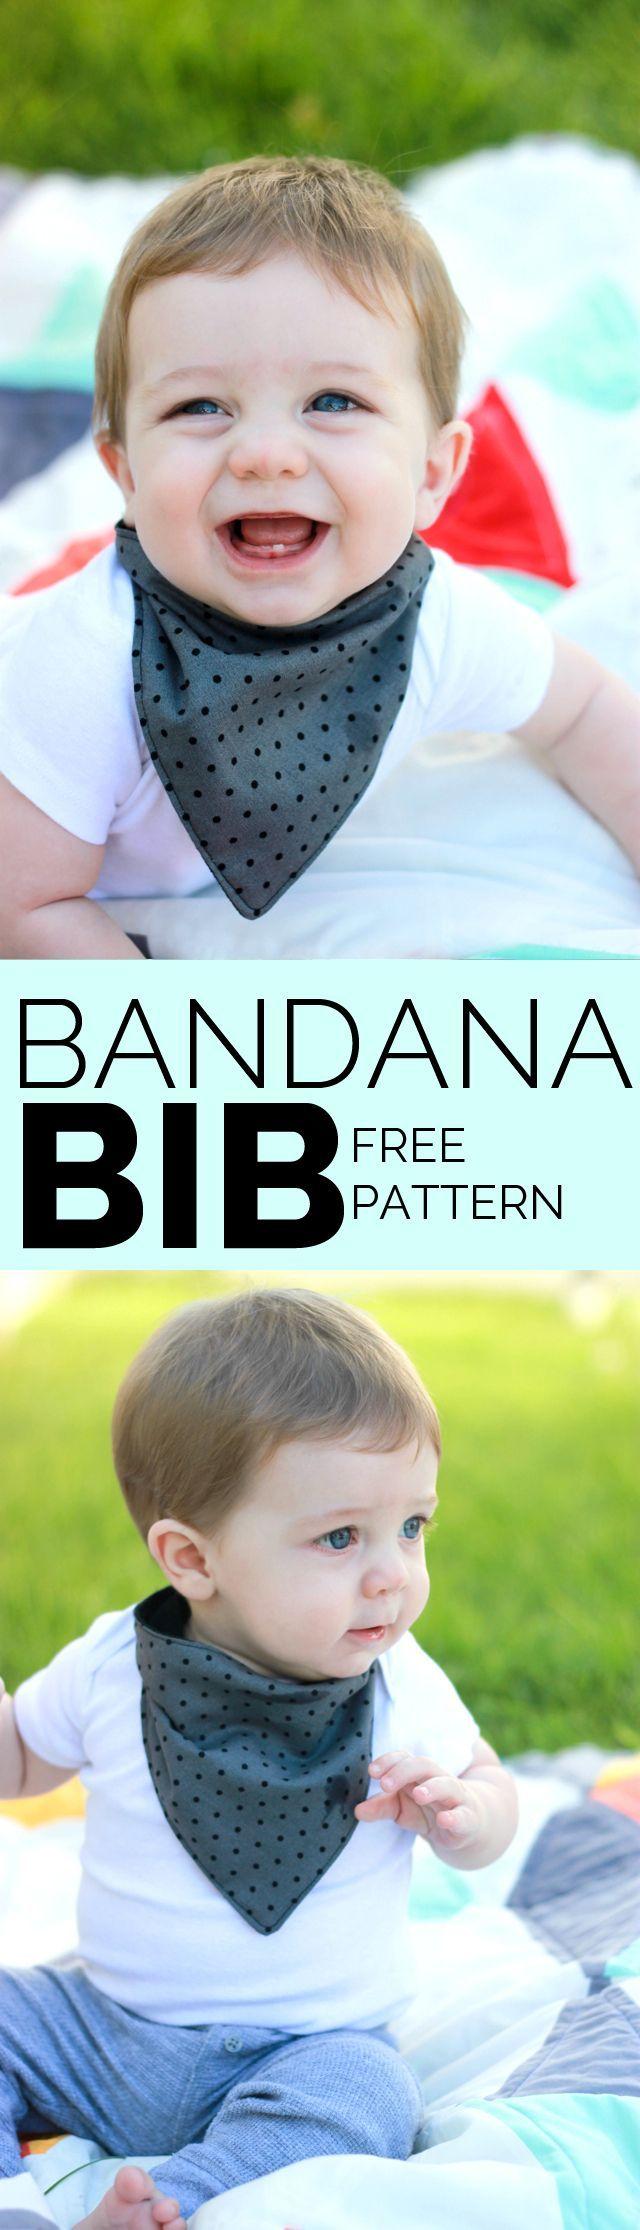 FREE bandana bib pattern! | bandana bib tutorial | how to make a bandana bib | diy baby bib | baby bib tutorial | baby sewing tutorials | sewing tips and tricks | diy baby gifts || see kate sew #diybib #babybib #sewingtutorials